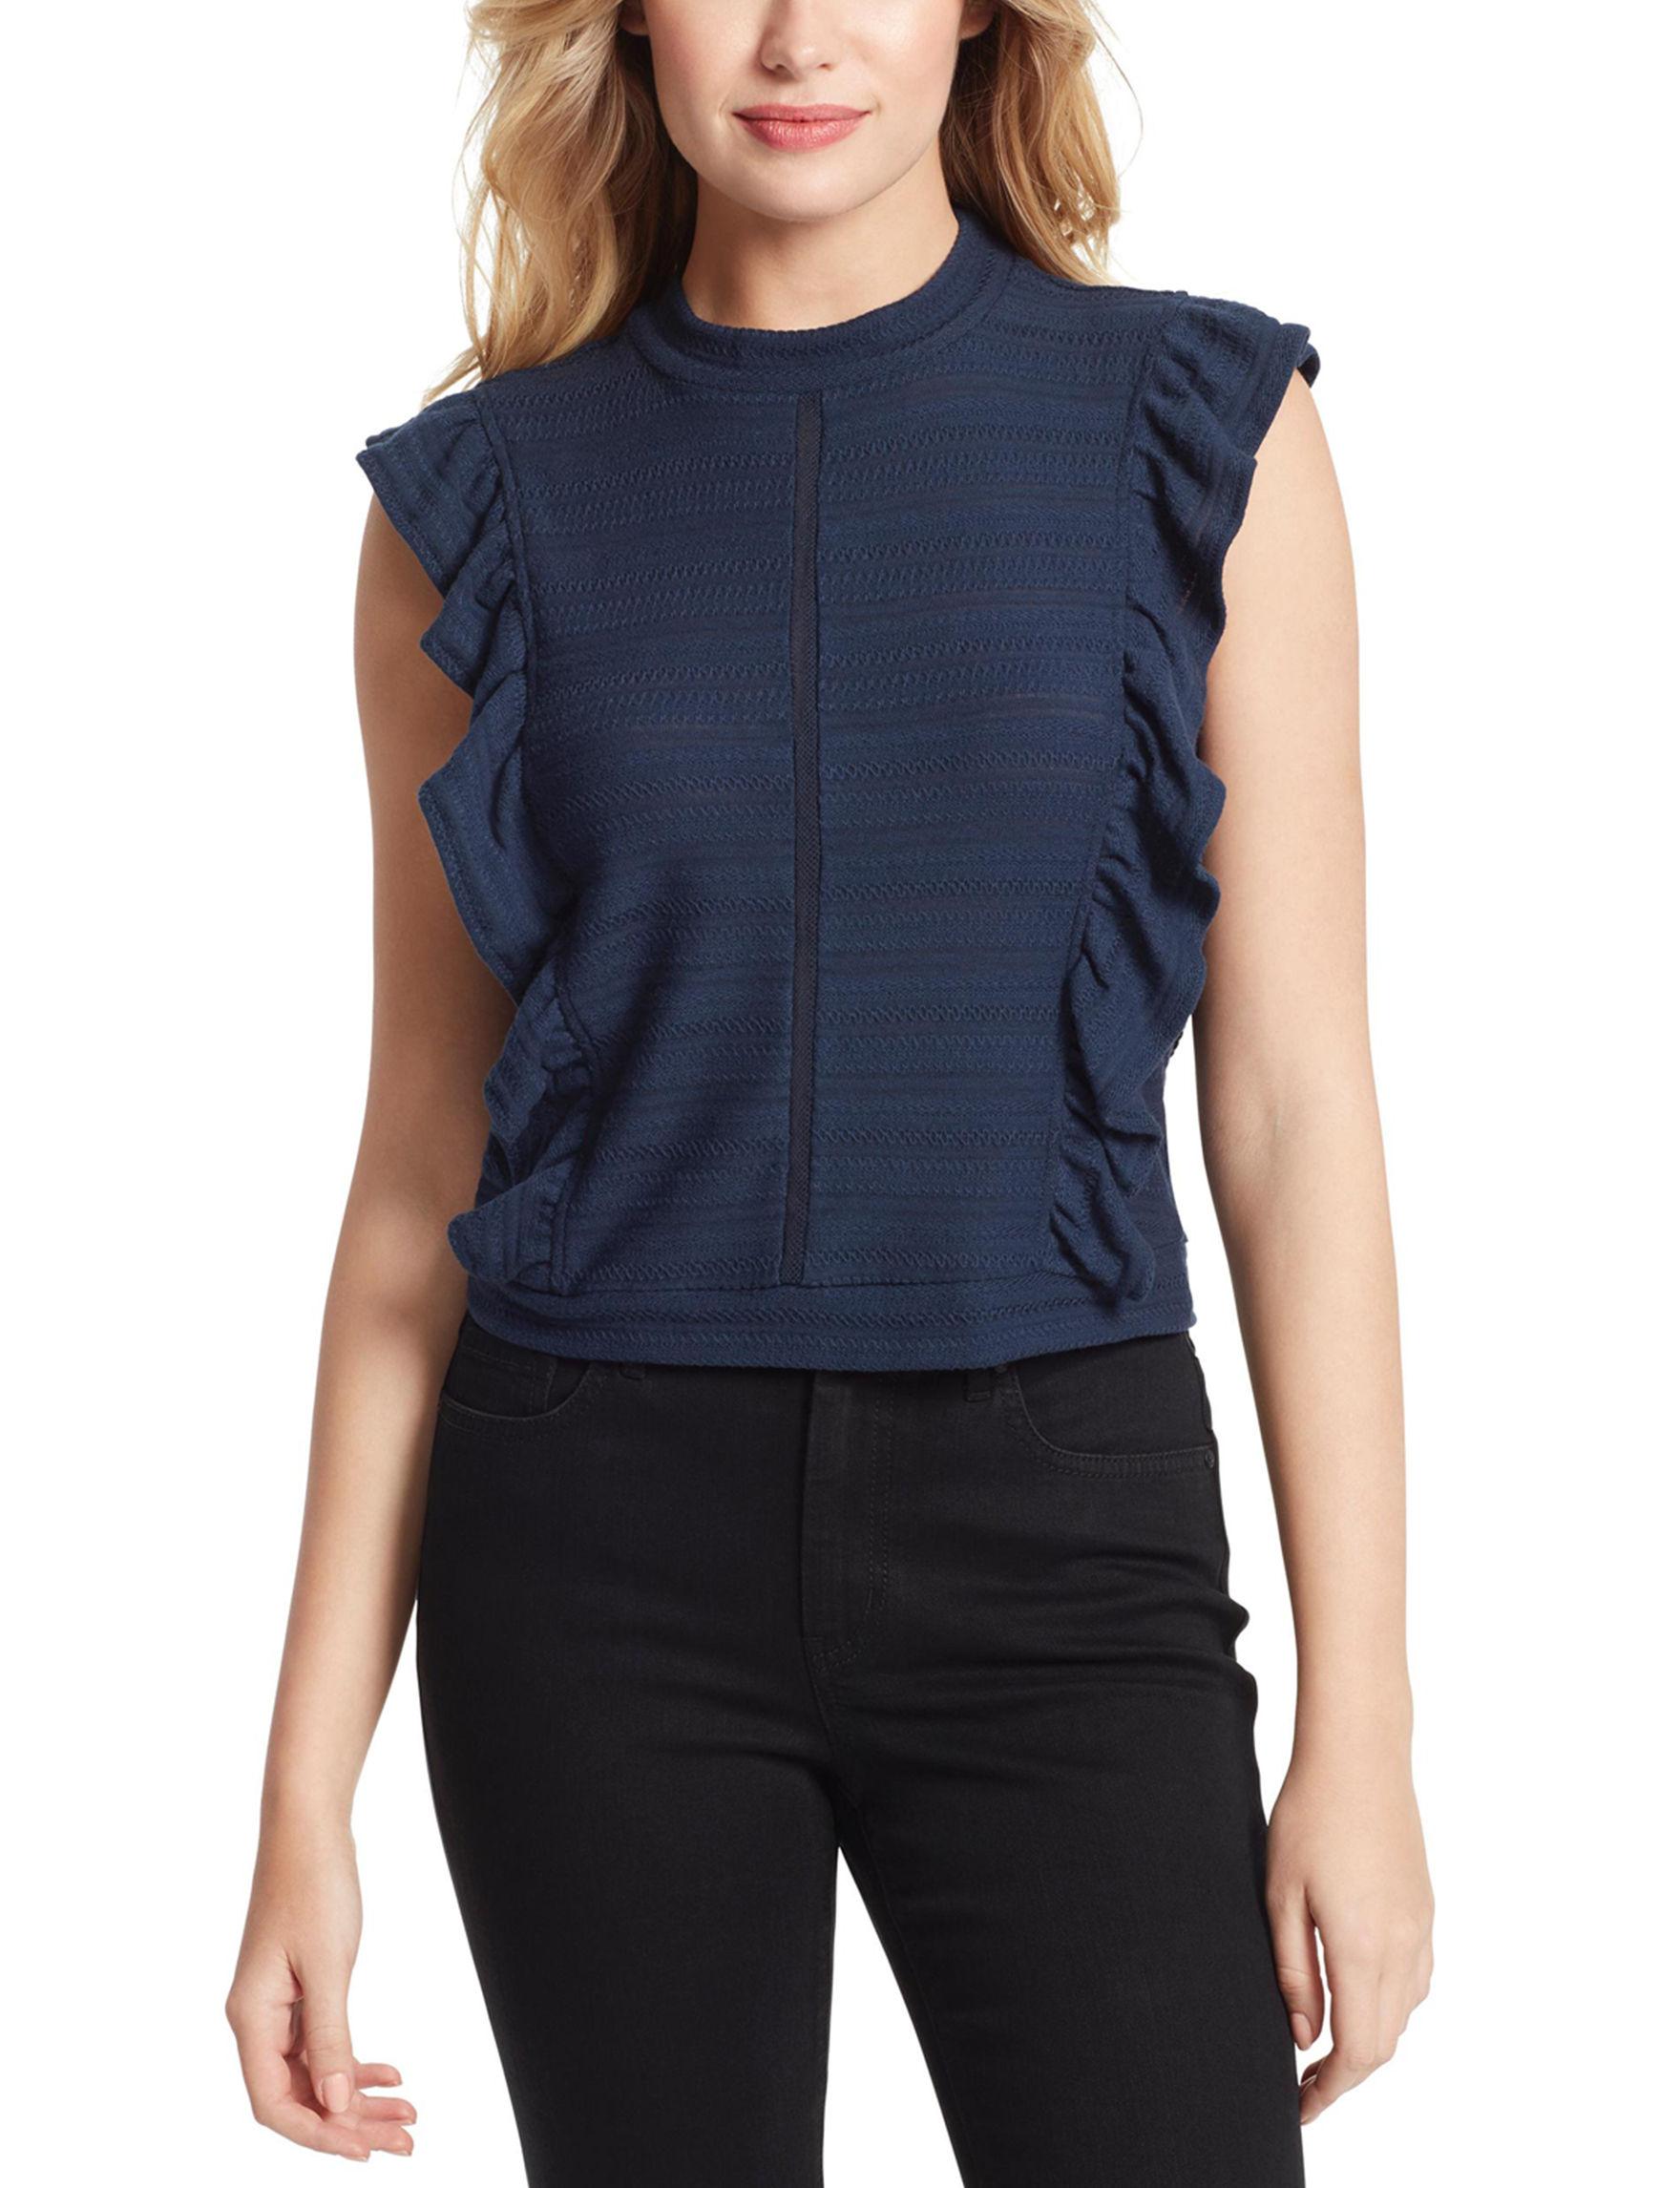 Jessica Simpson Navy Shirts & Blouses